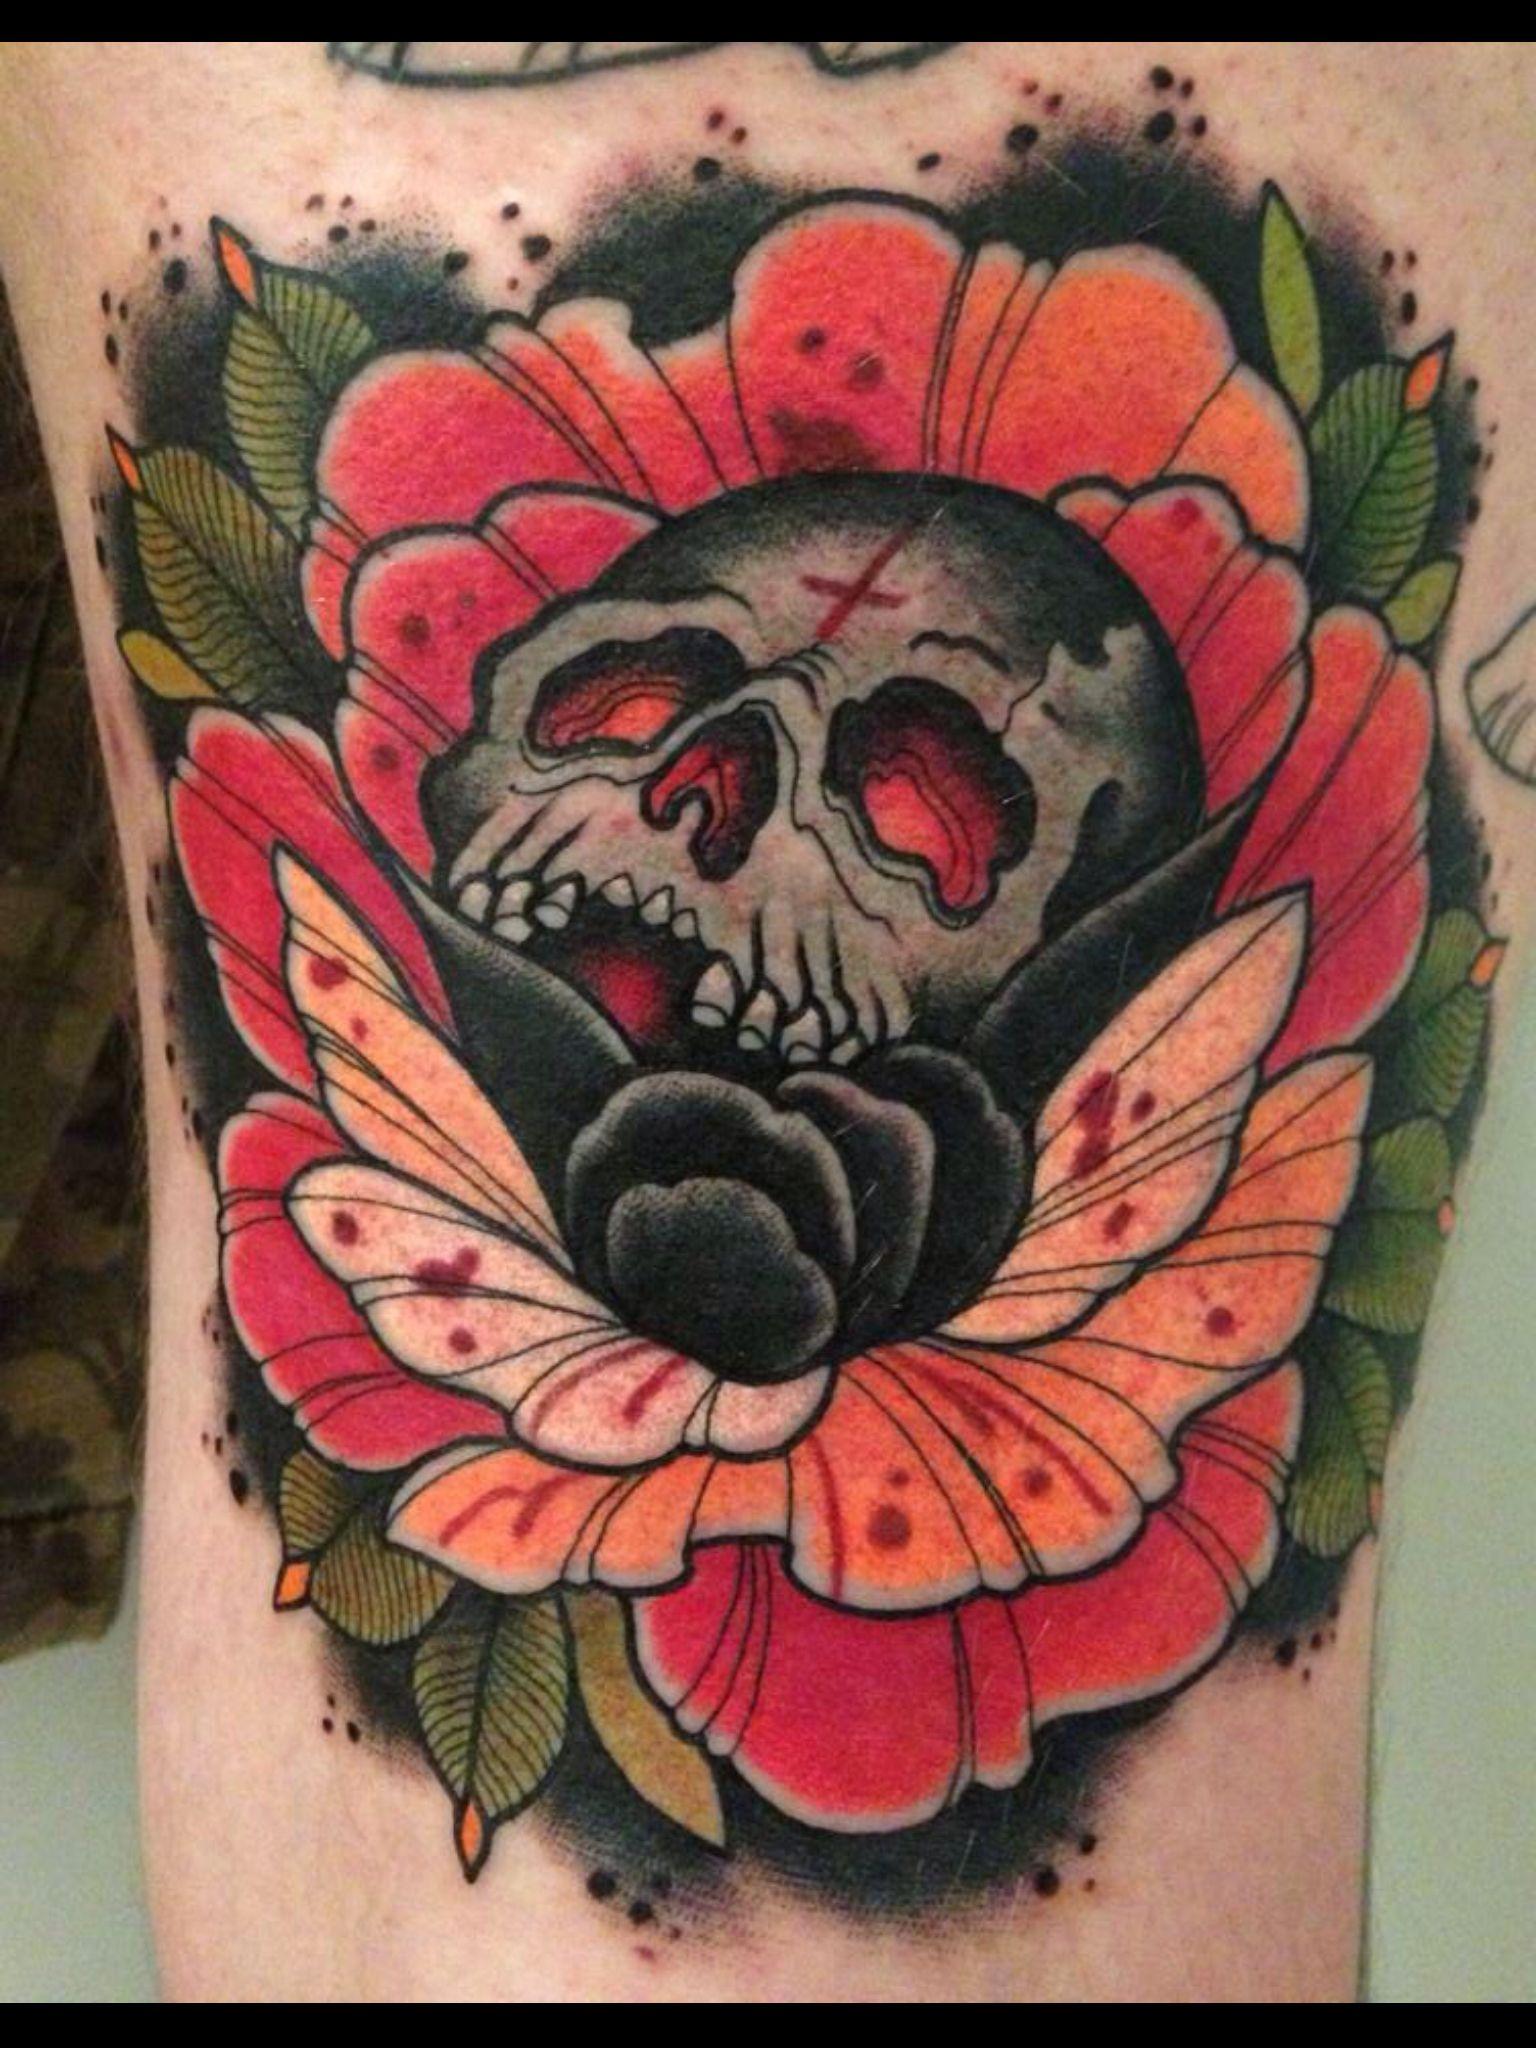 Inkedrad Tattoo Blog Manos Tattoo Manga Del Tatuaje Tatuajes Impresionantes